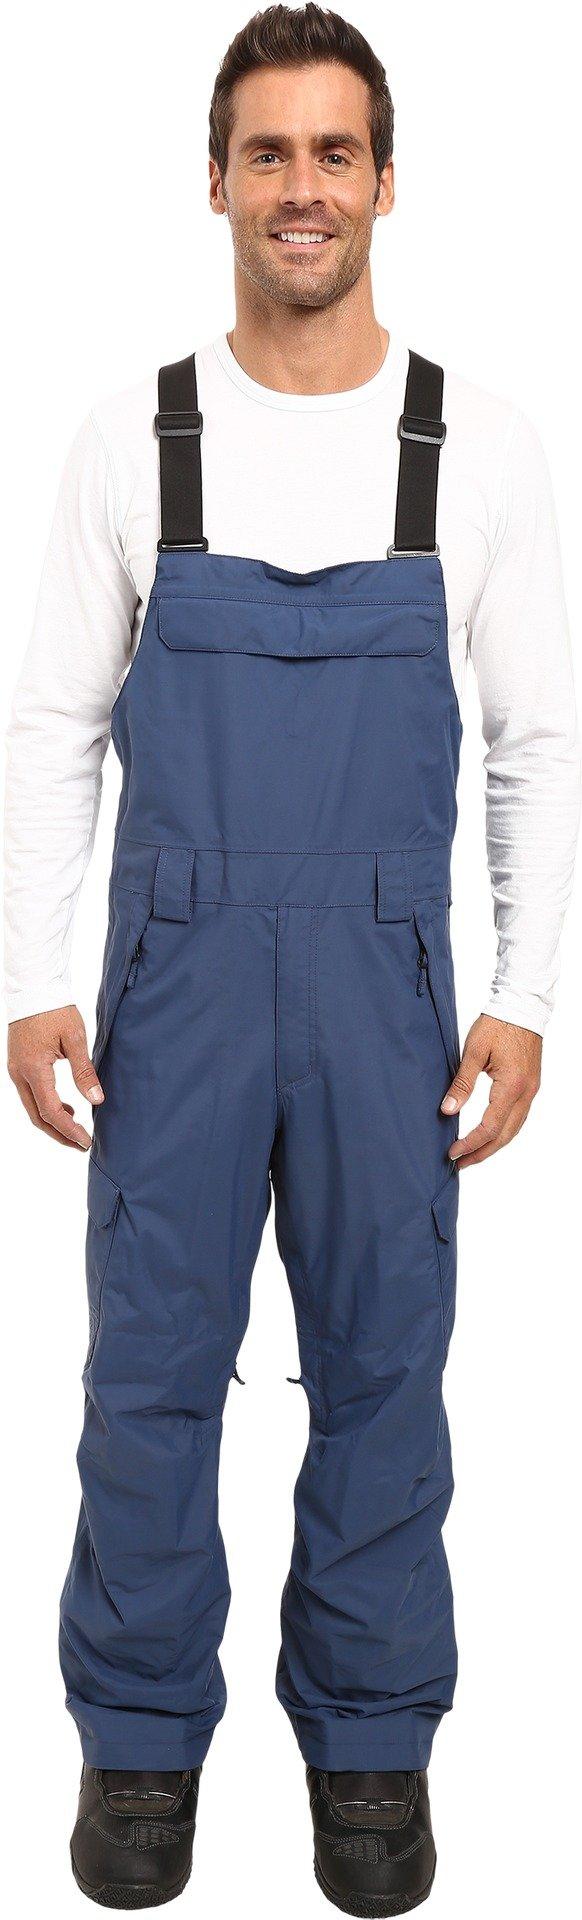 The North Face Men's Anchor Bib Pants Shady Blue (Prior Season) Large R